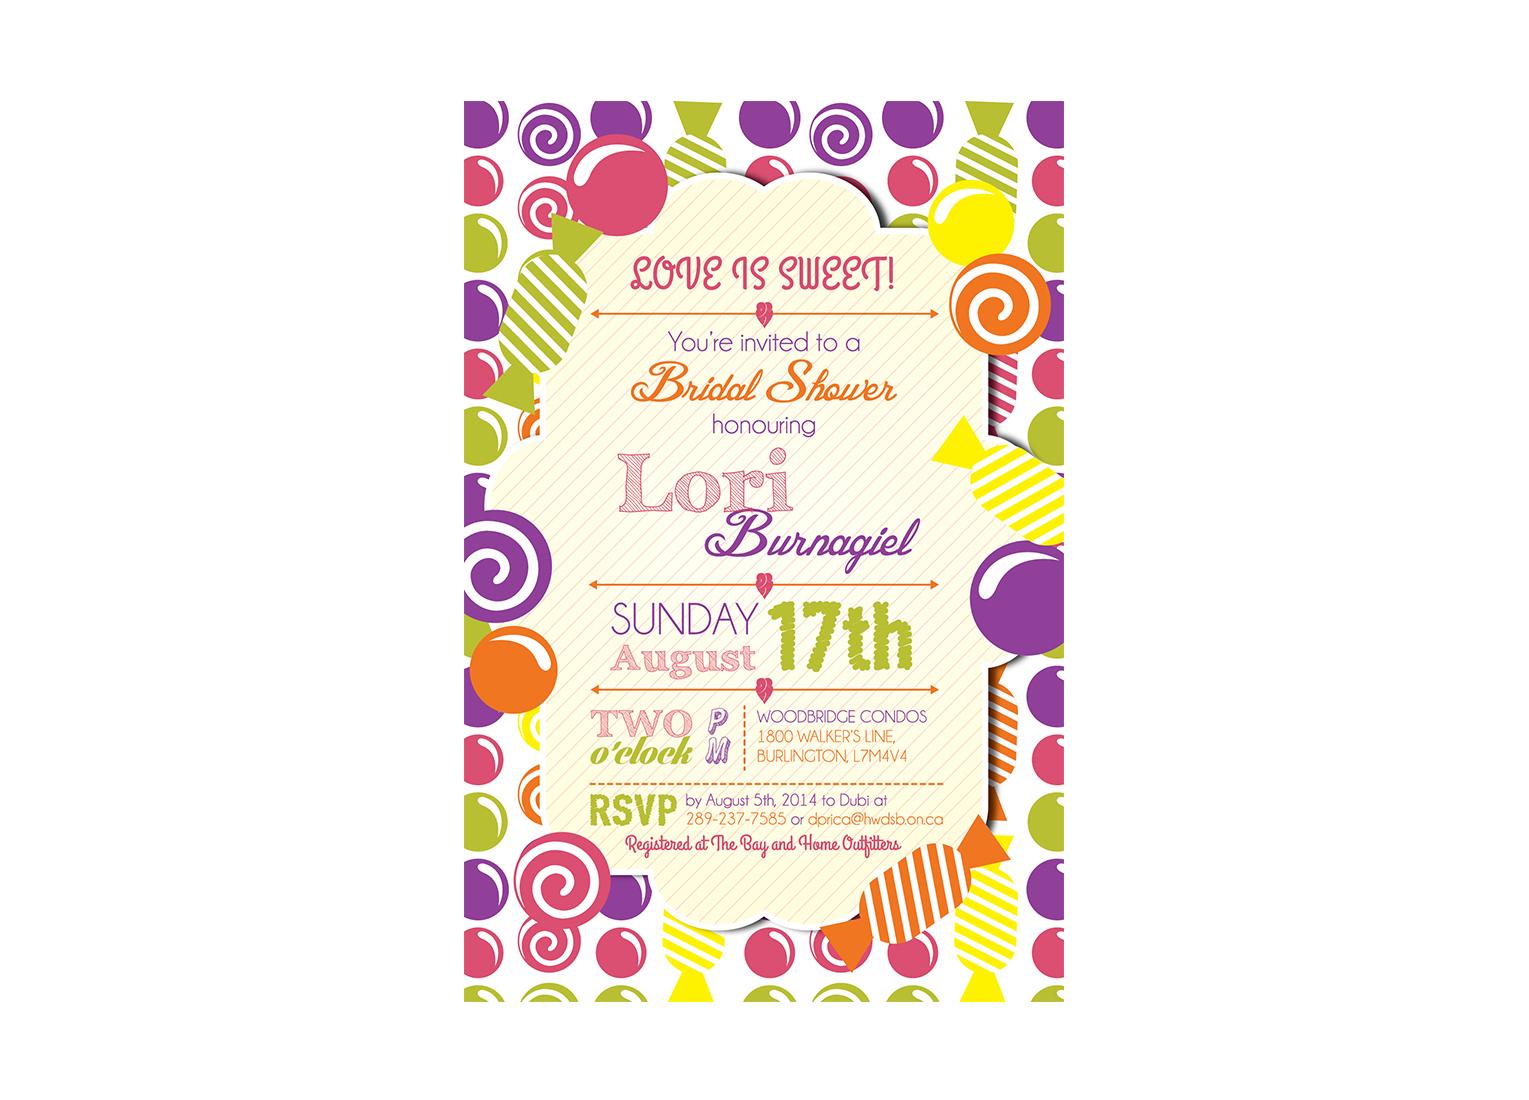 Copy of Wedding Invitation Design